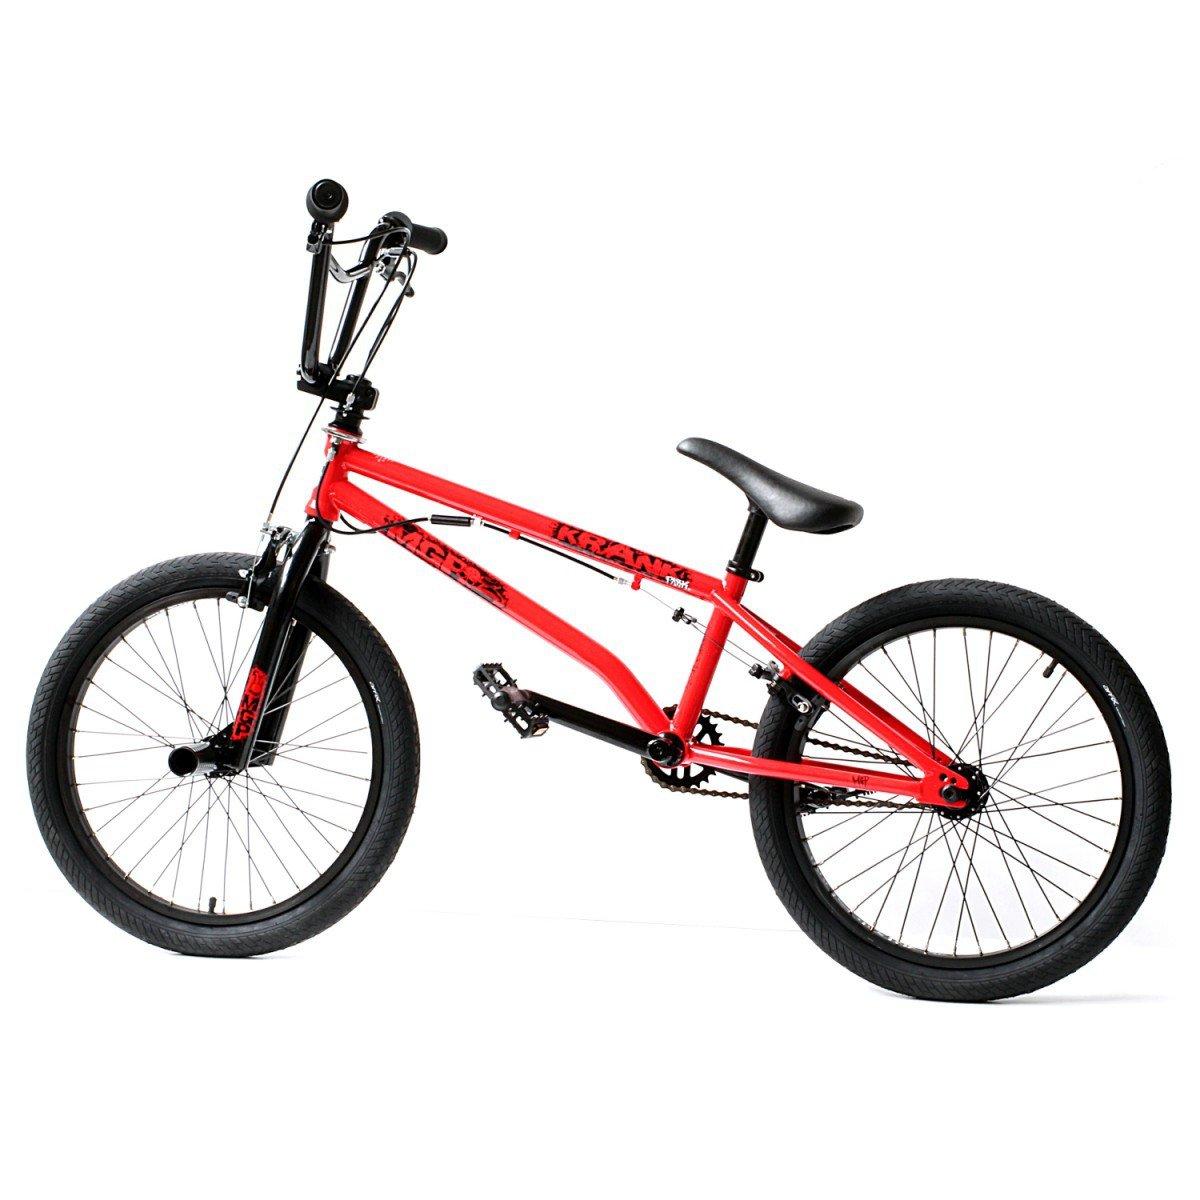 Madd Mgp 20 Bmx Bike Krank Park Red 2012 Stunt Bike Amazon Co